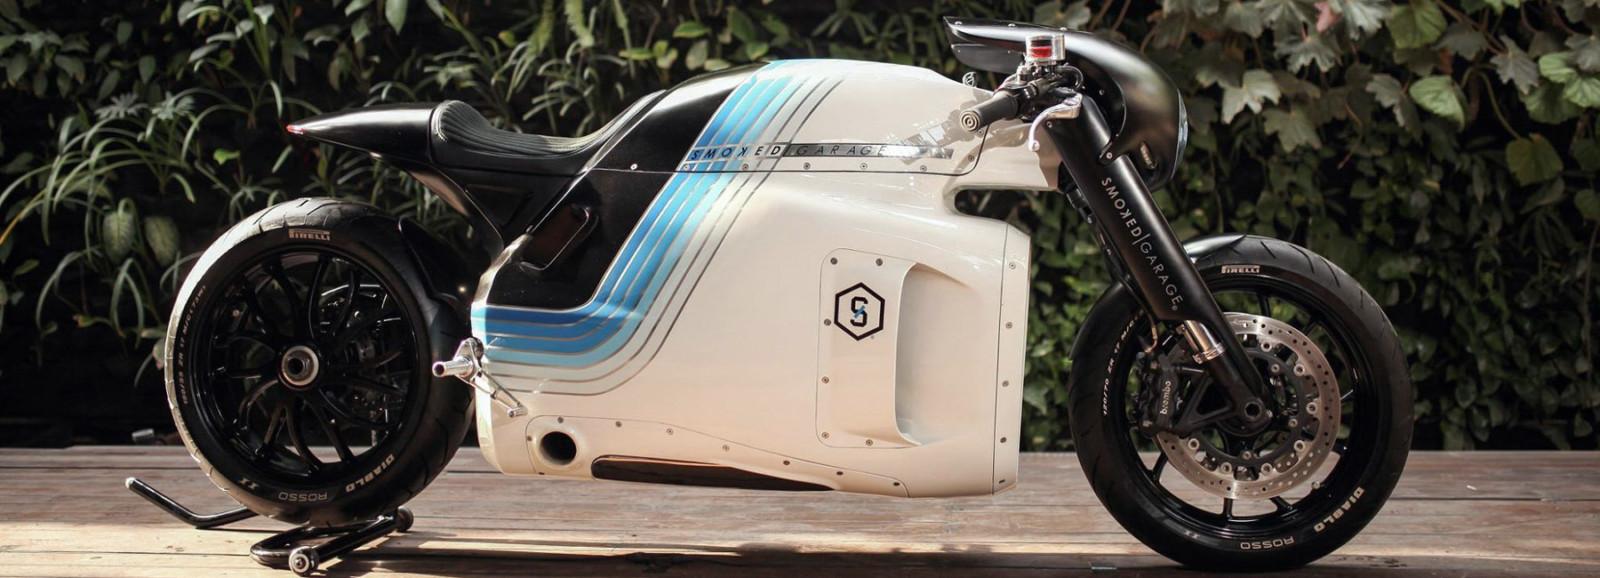 SuruLT_motociklas_01